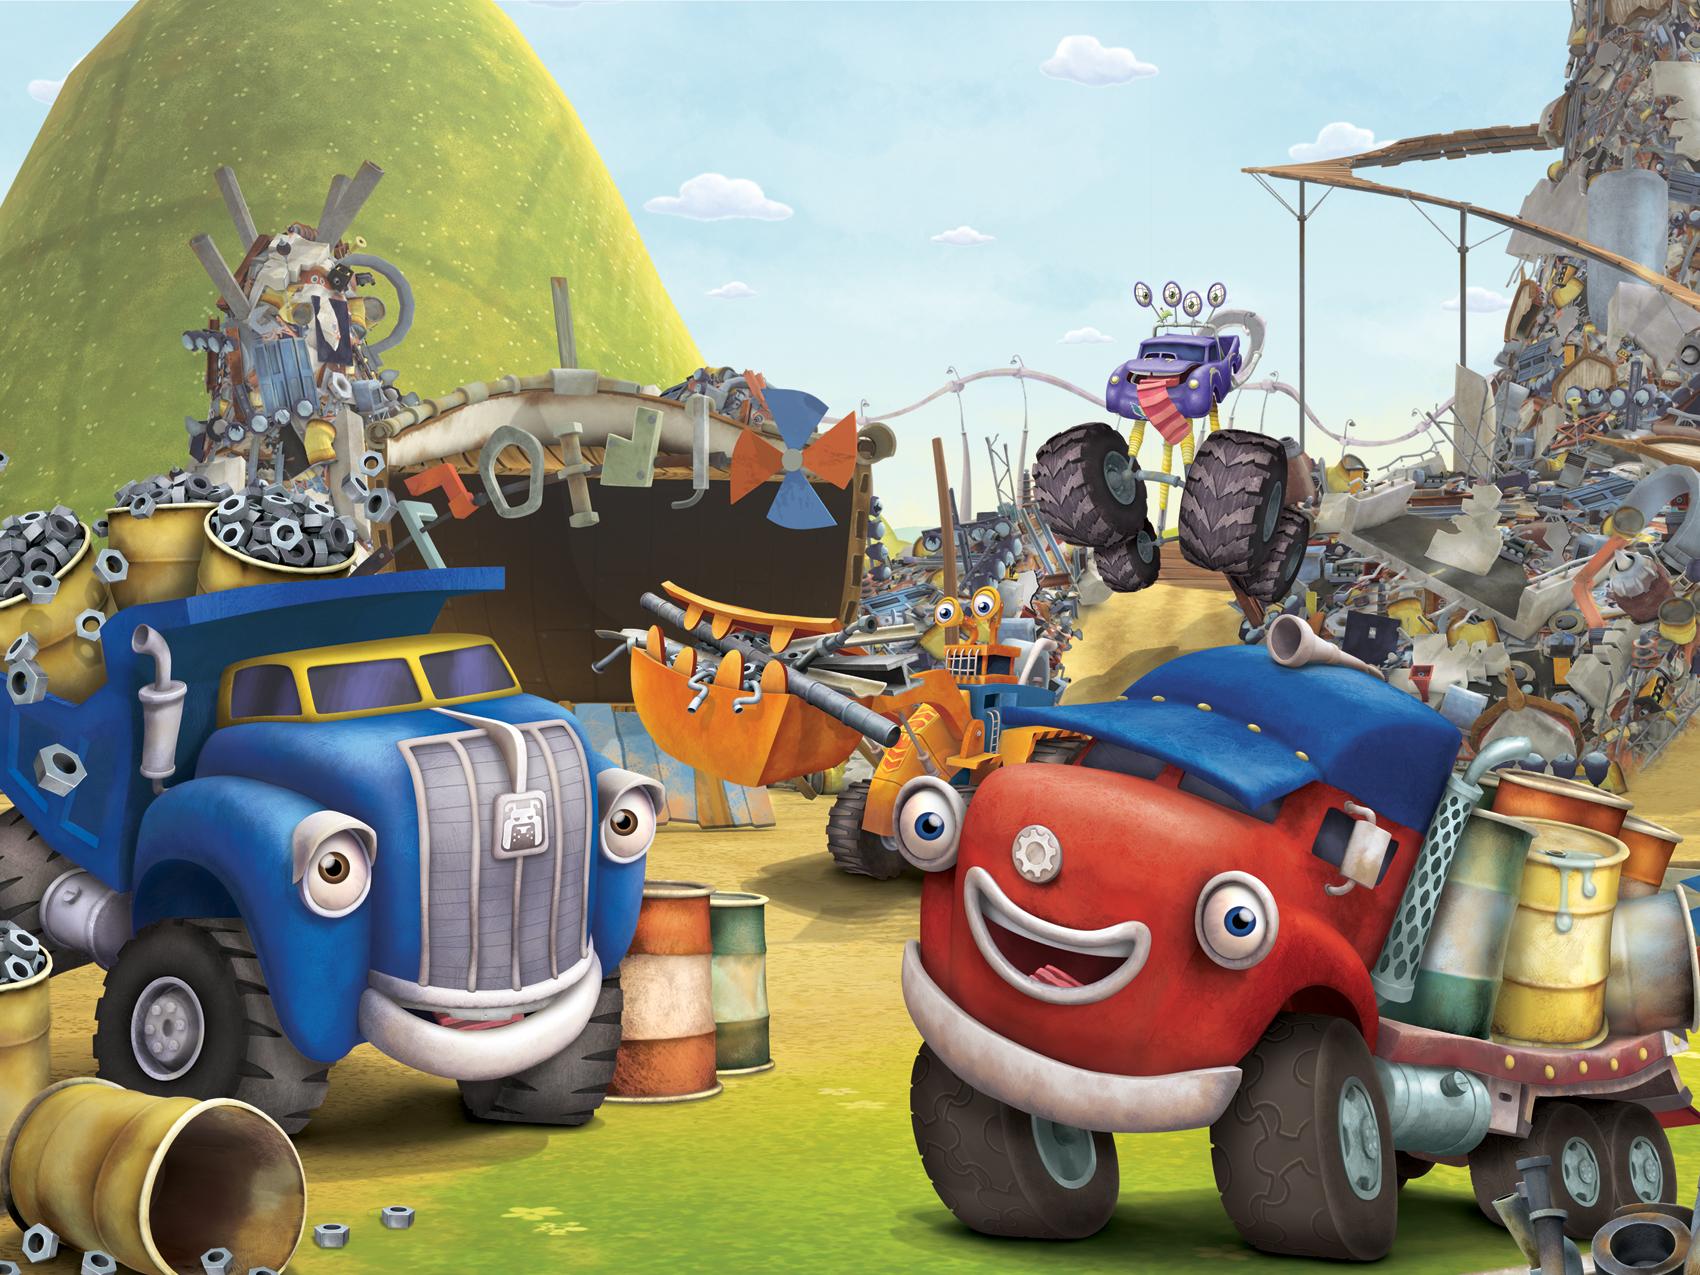 Copied from Kidscreen - TruckTown